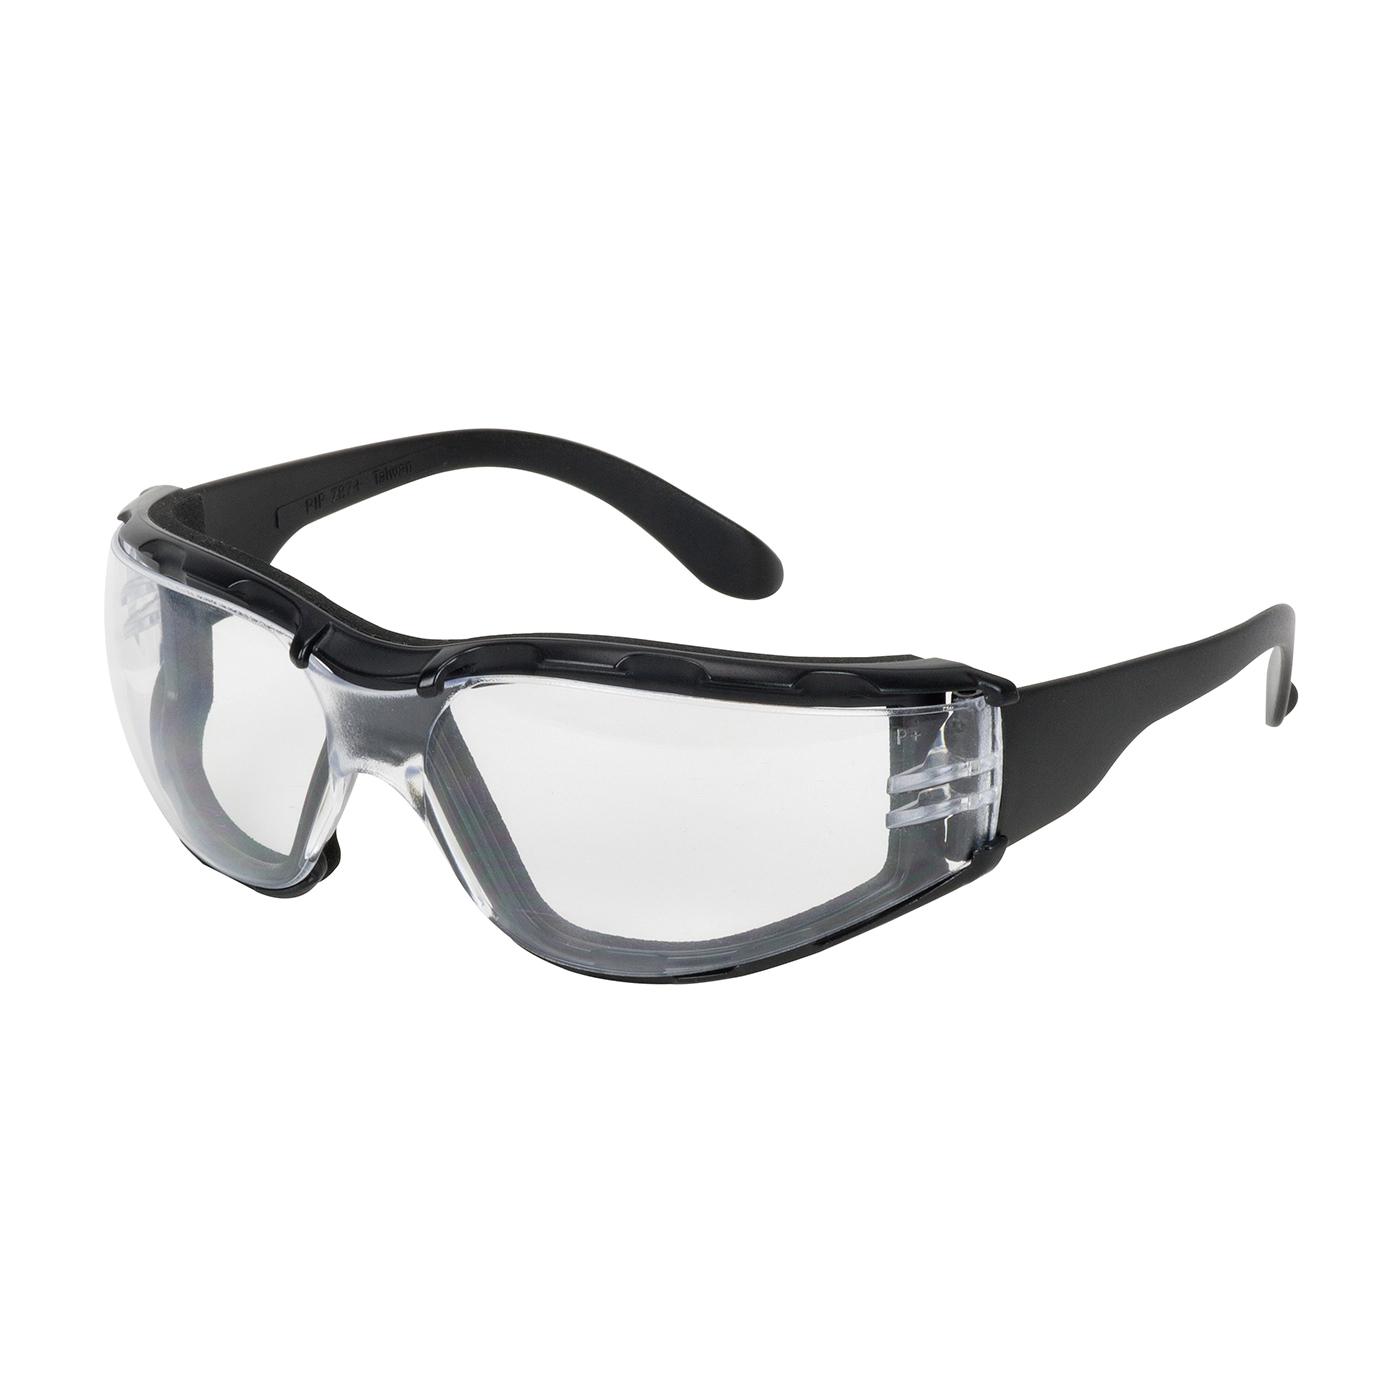 Bouton® 250-01-F020 Zenon Z12™ Foam 250-01 Single Lens Safety Glasses, Anti-Fog/Anti-Scratch, Clear Lens, Rimless Frame, Black, Polycarbonate Frame, Polycarbonate Lens, ANSI Z87.1+